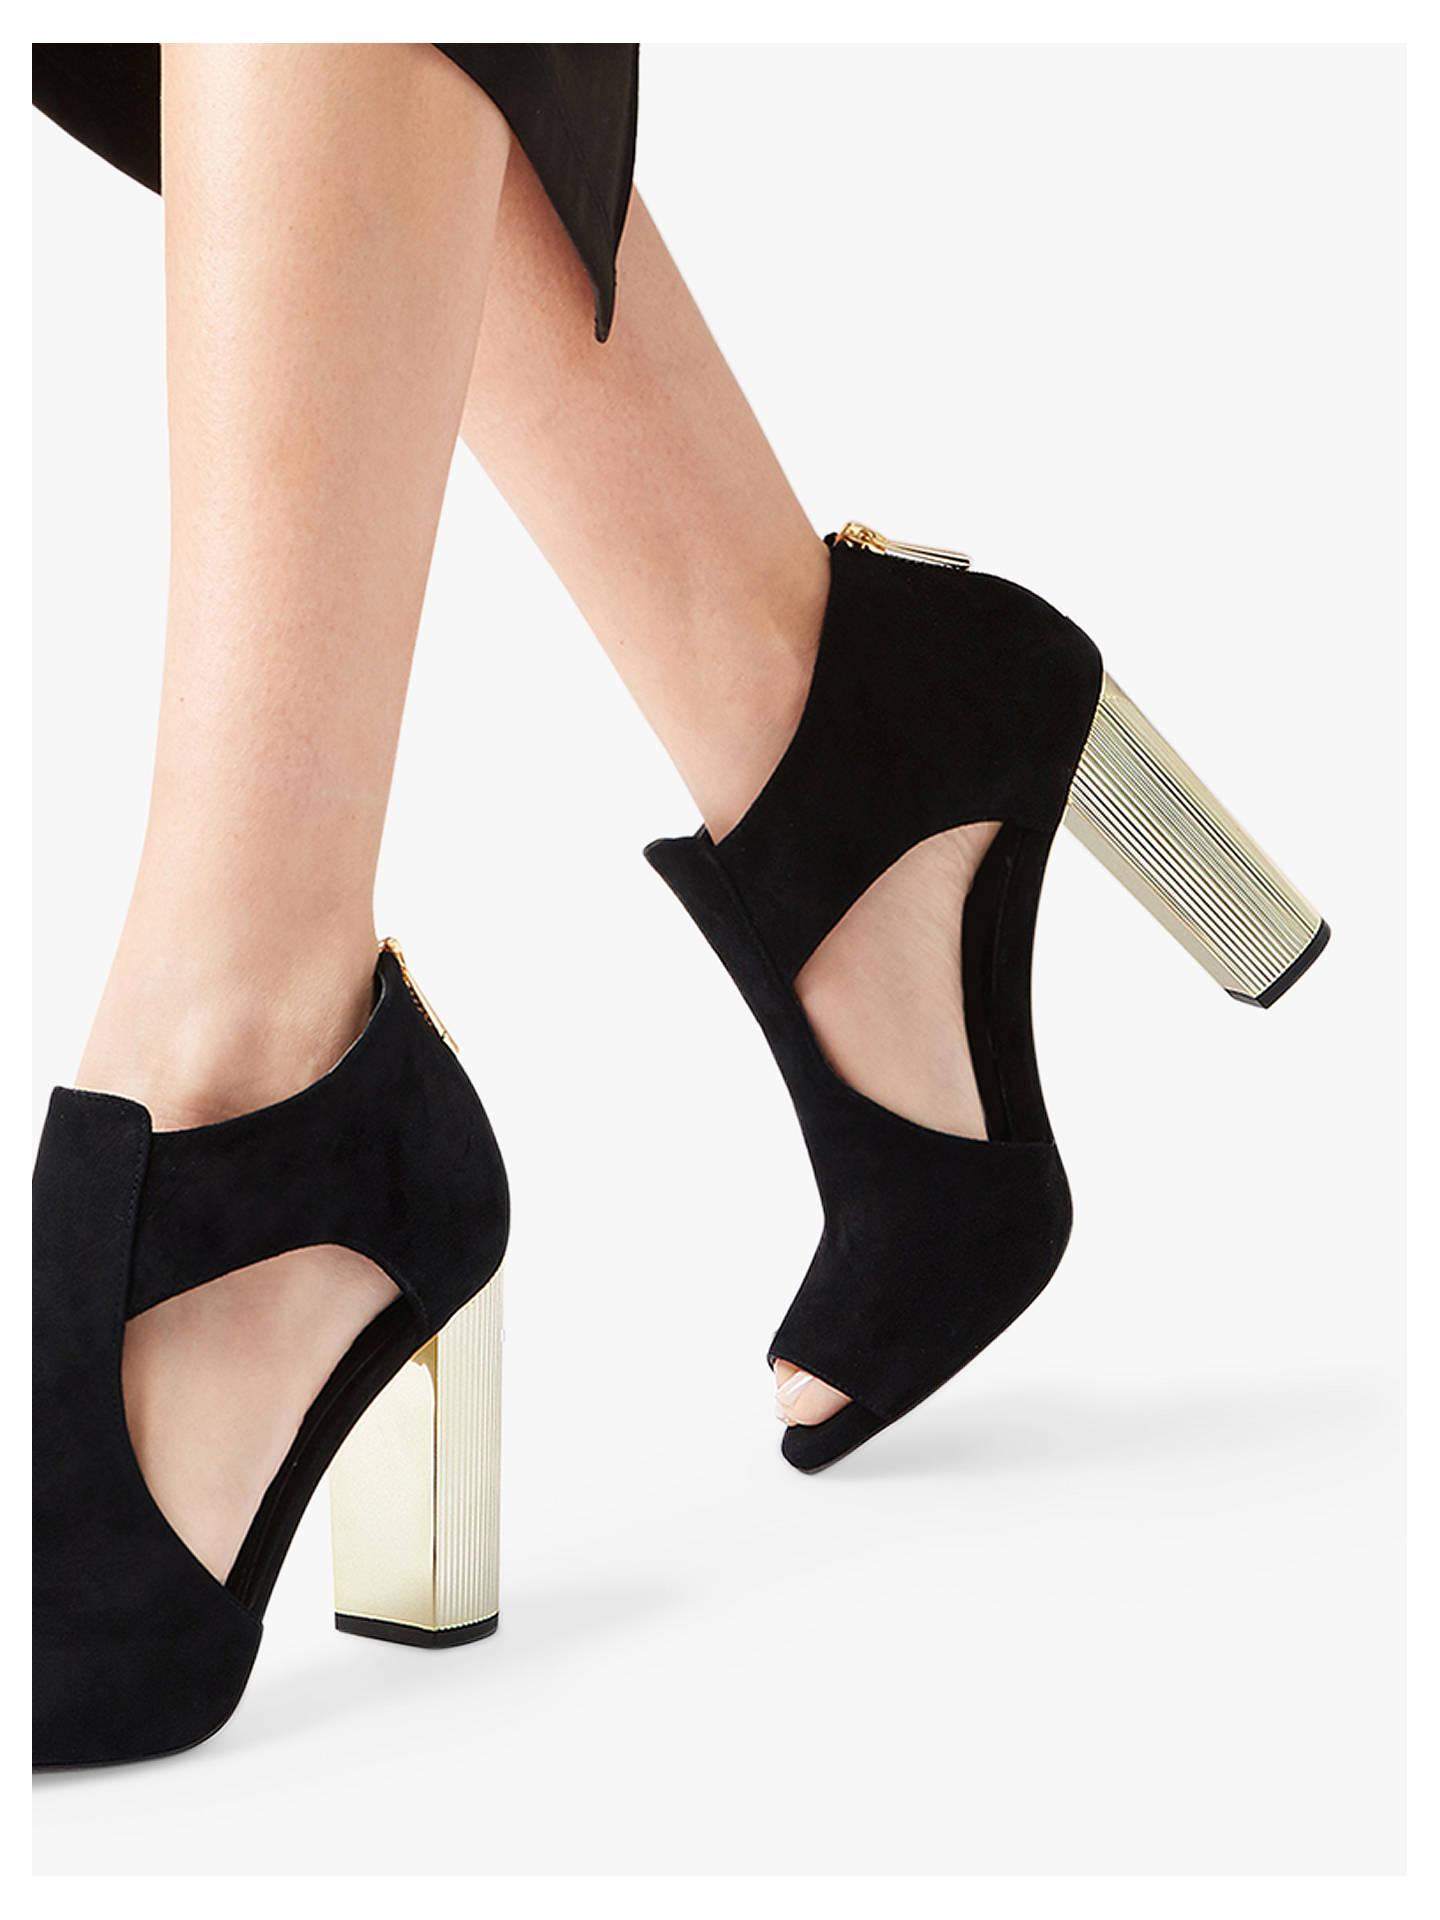 618f8edf4 ... Buy MICHAEL Michael Kors Paloma Block Heel Peep Toe Shoe Boots, Black  Suede, 3 ...